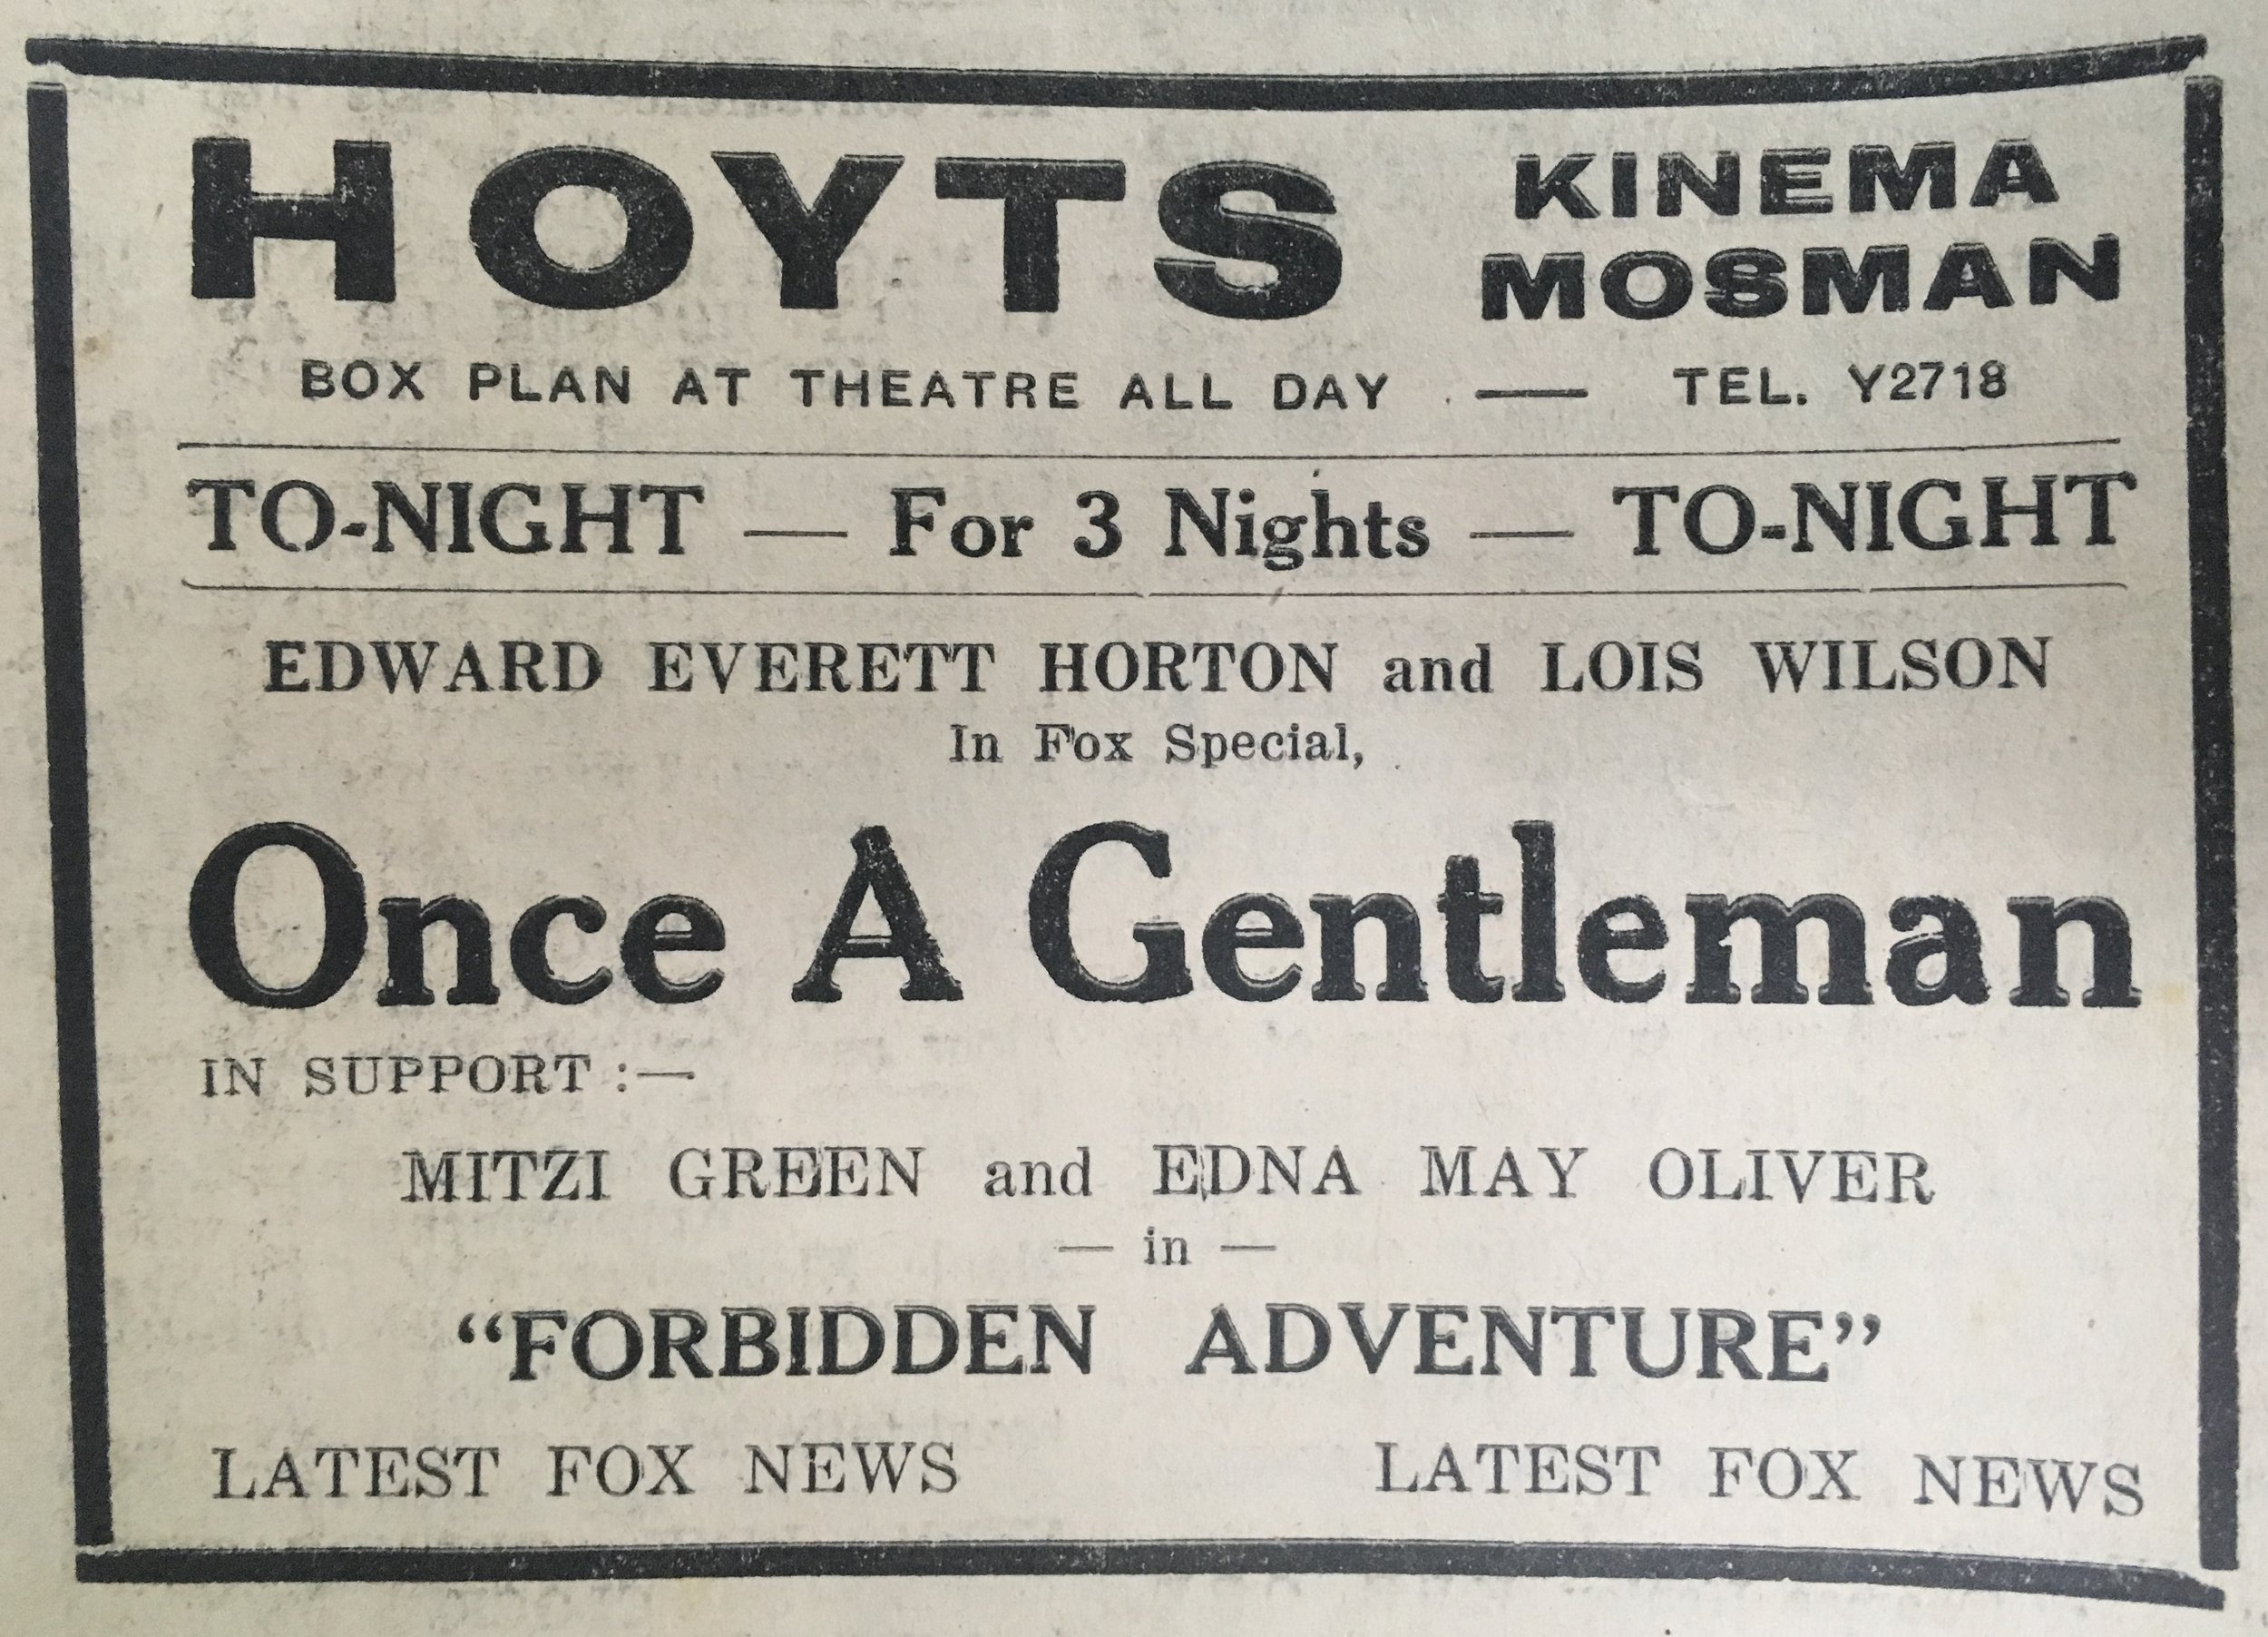 Hoyts Kinema advertisement.JPG